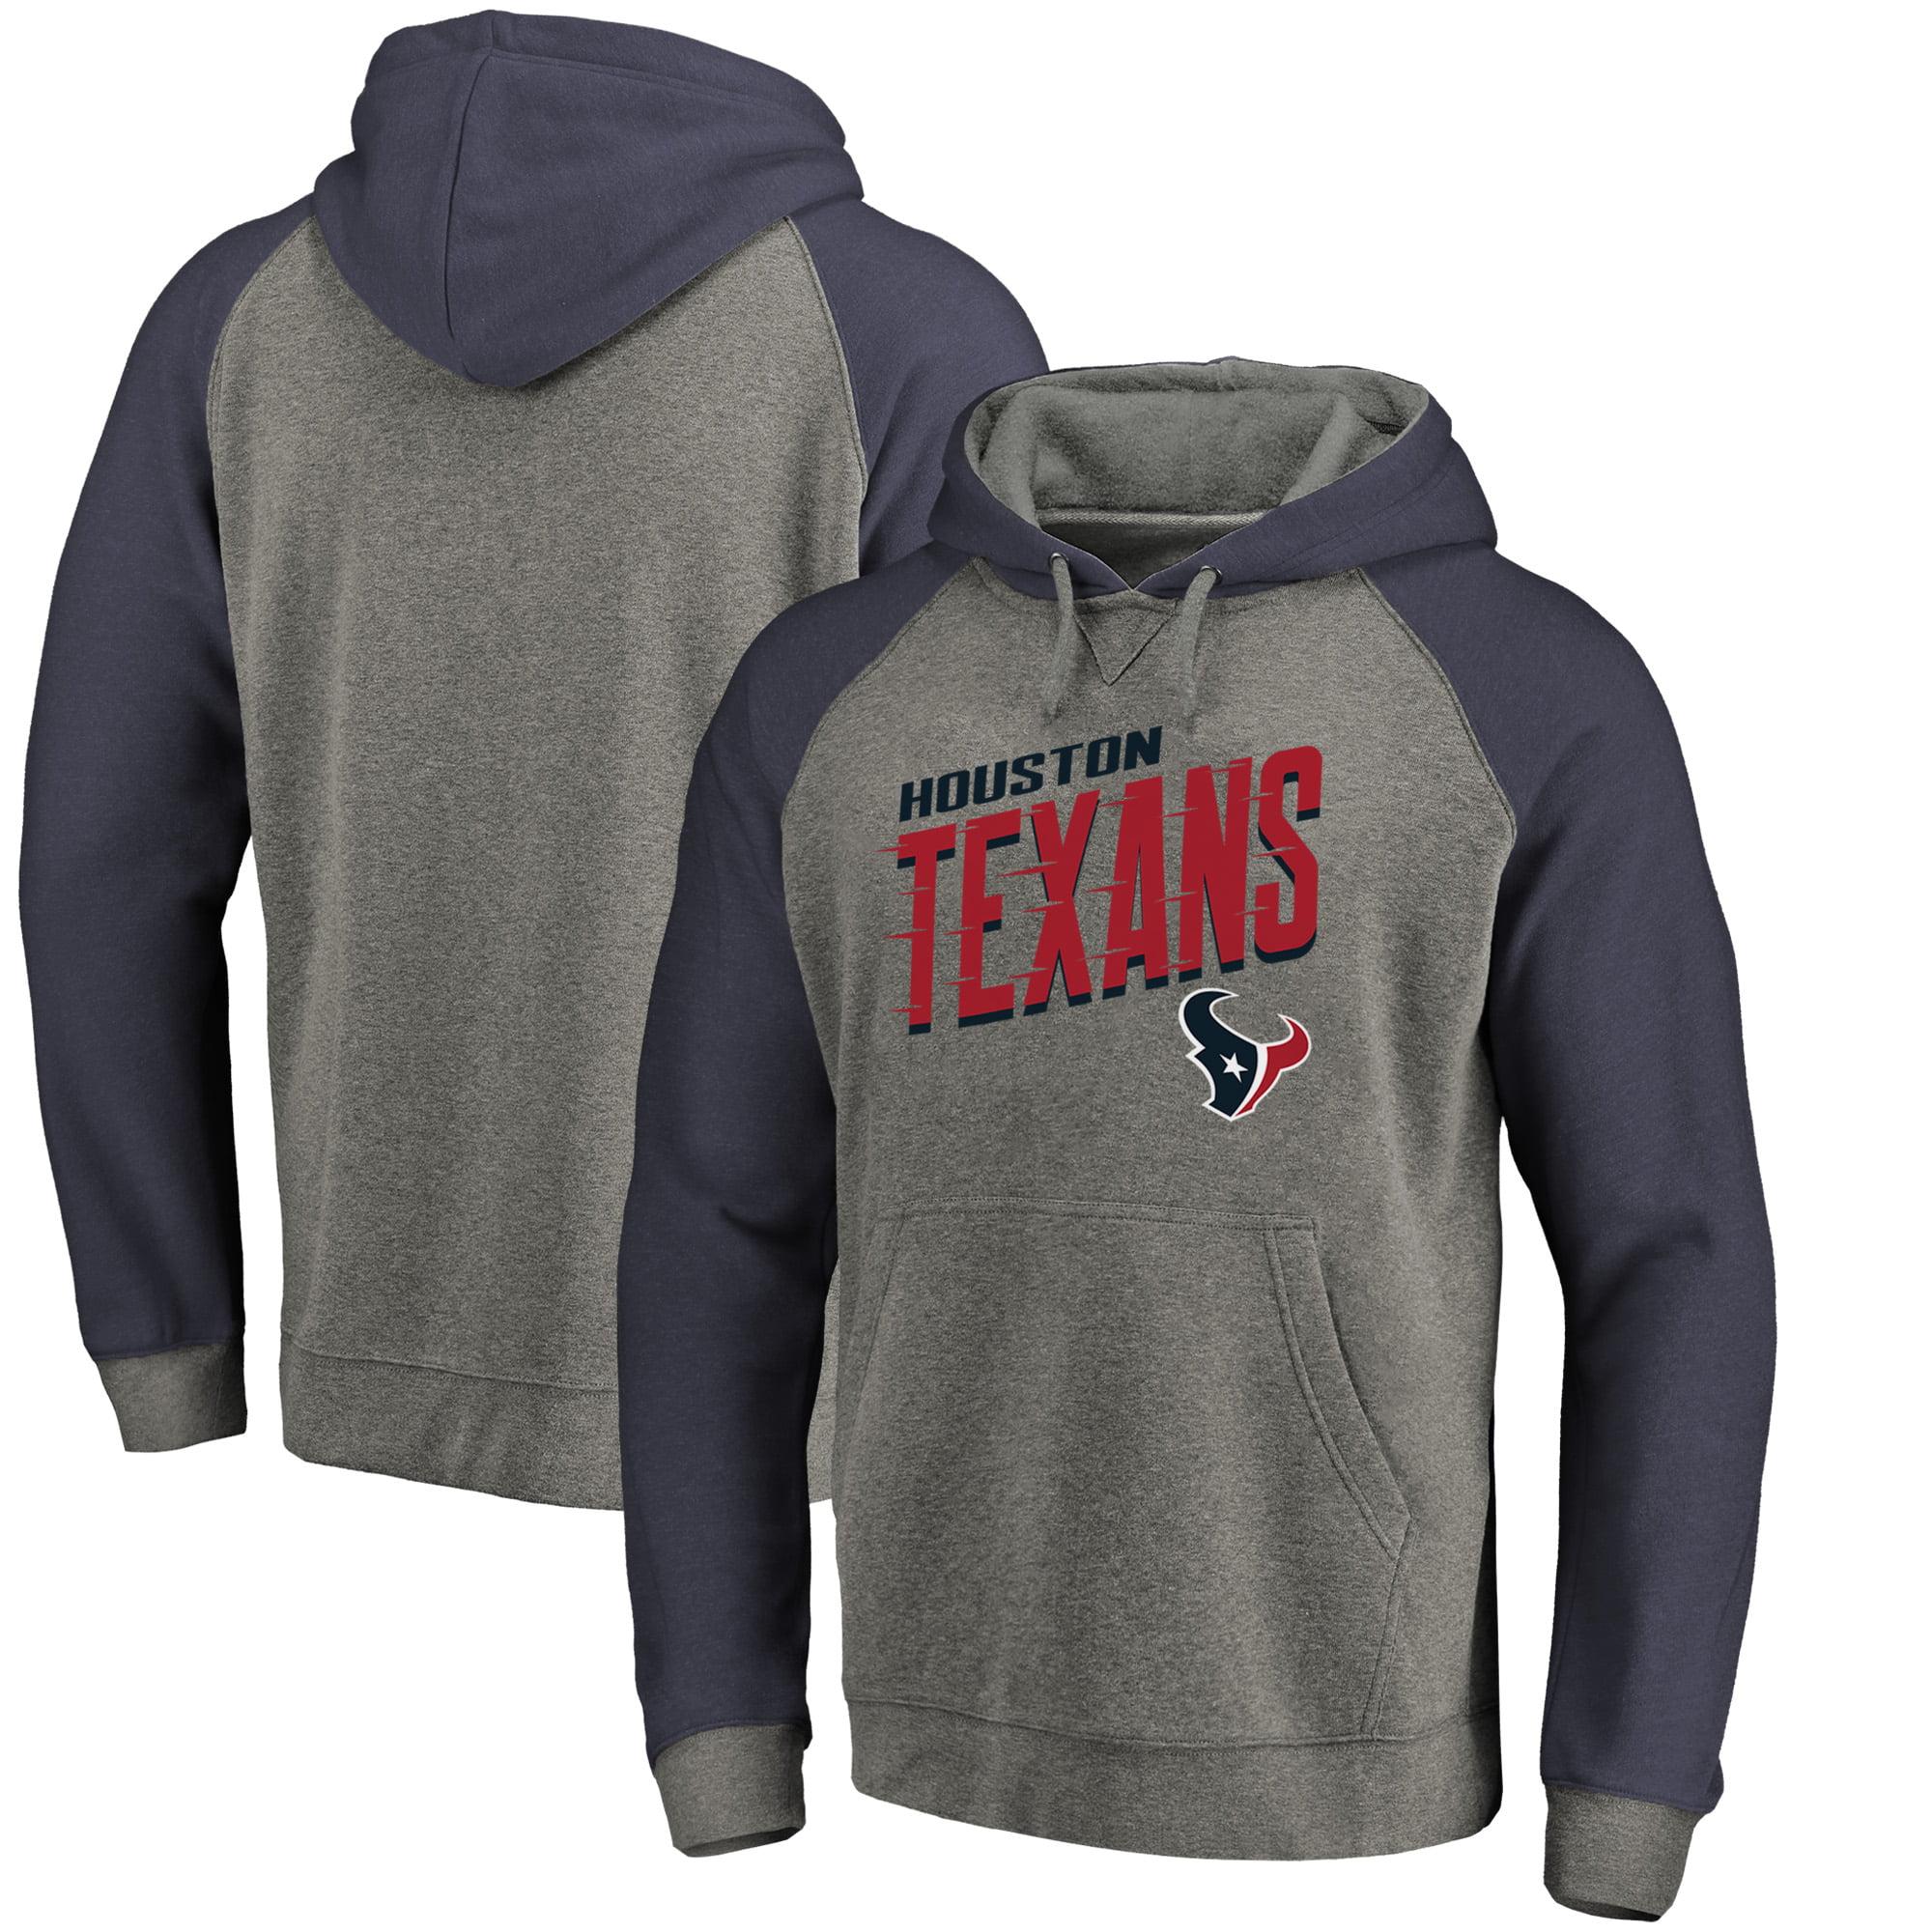 Houston Texans NFL Pro Line by Fanatics Branded Slant Strike Tri-Blend Raglan Pullover Hoodie - Heathered Gray